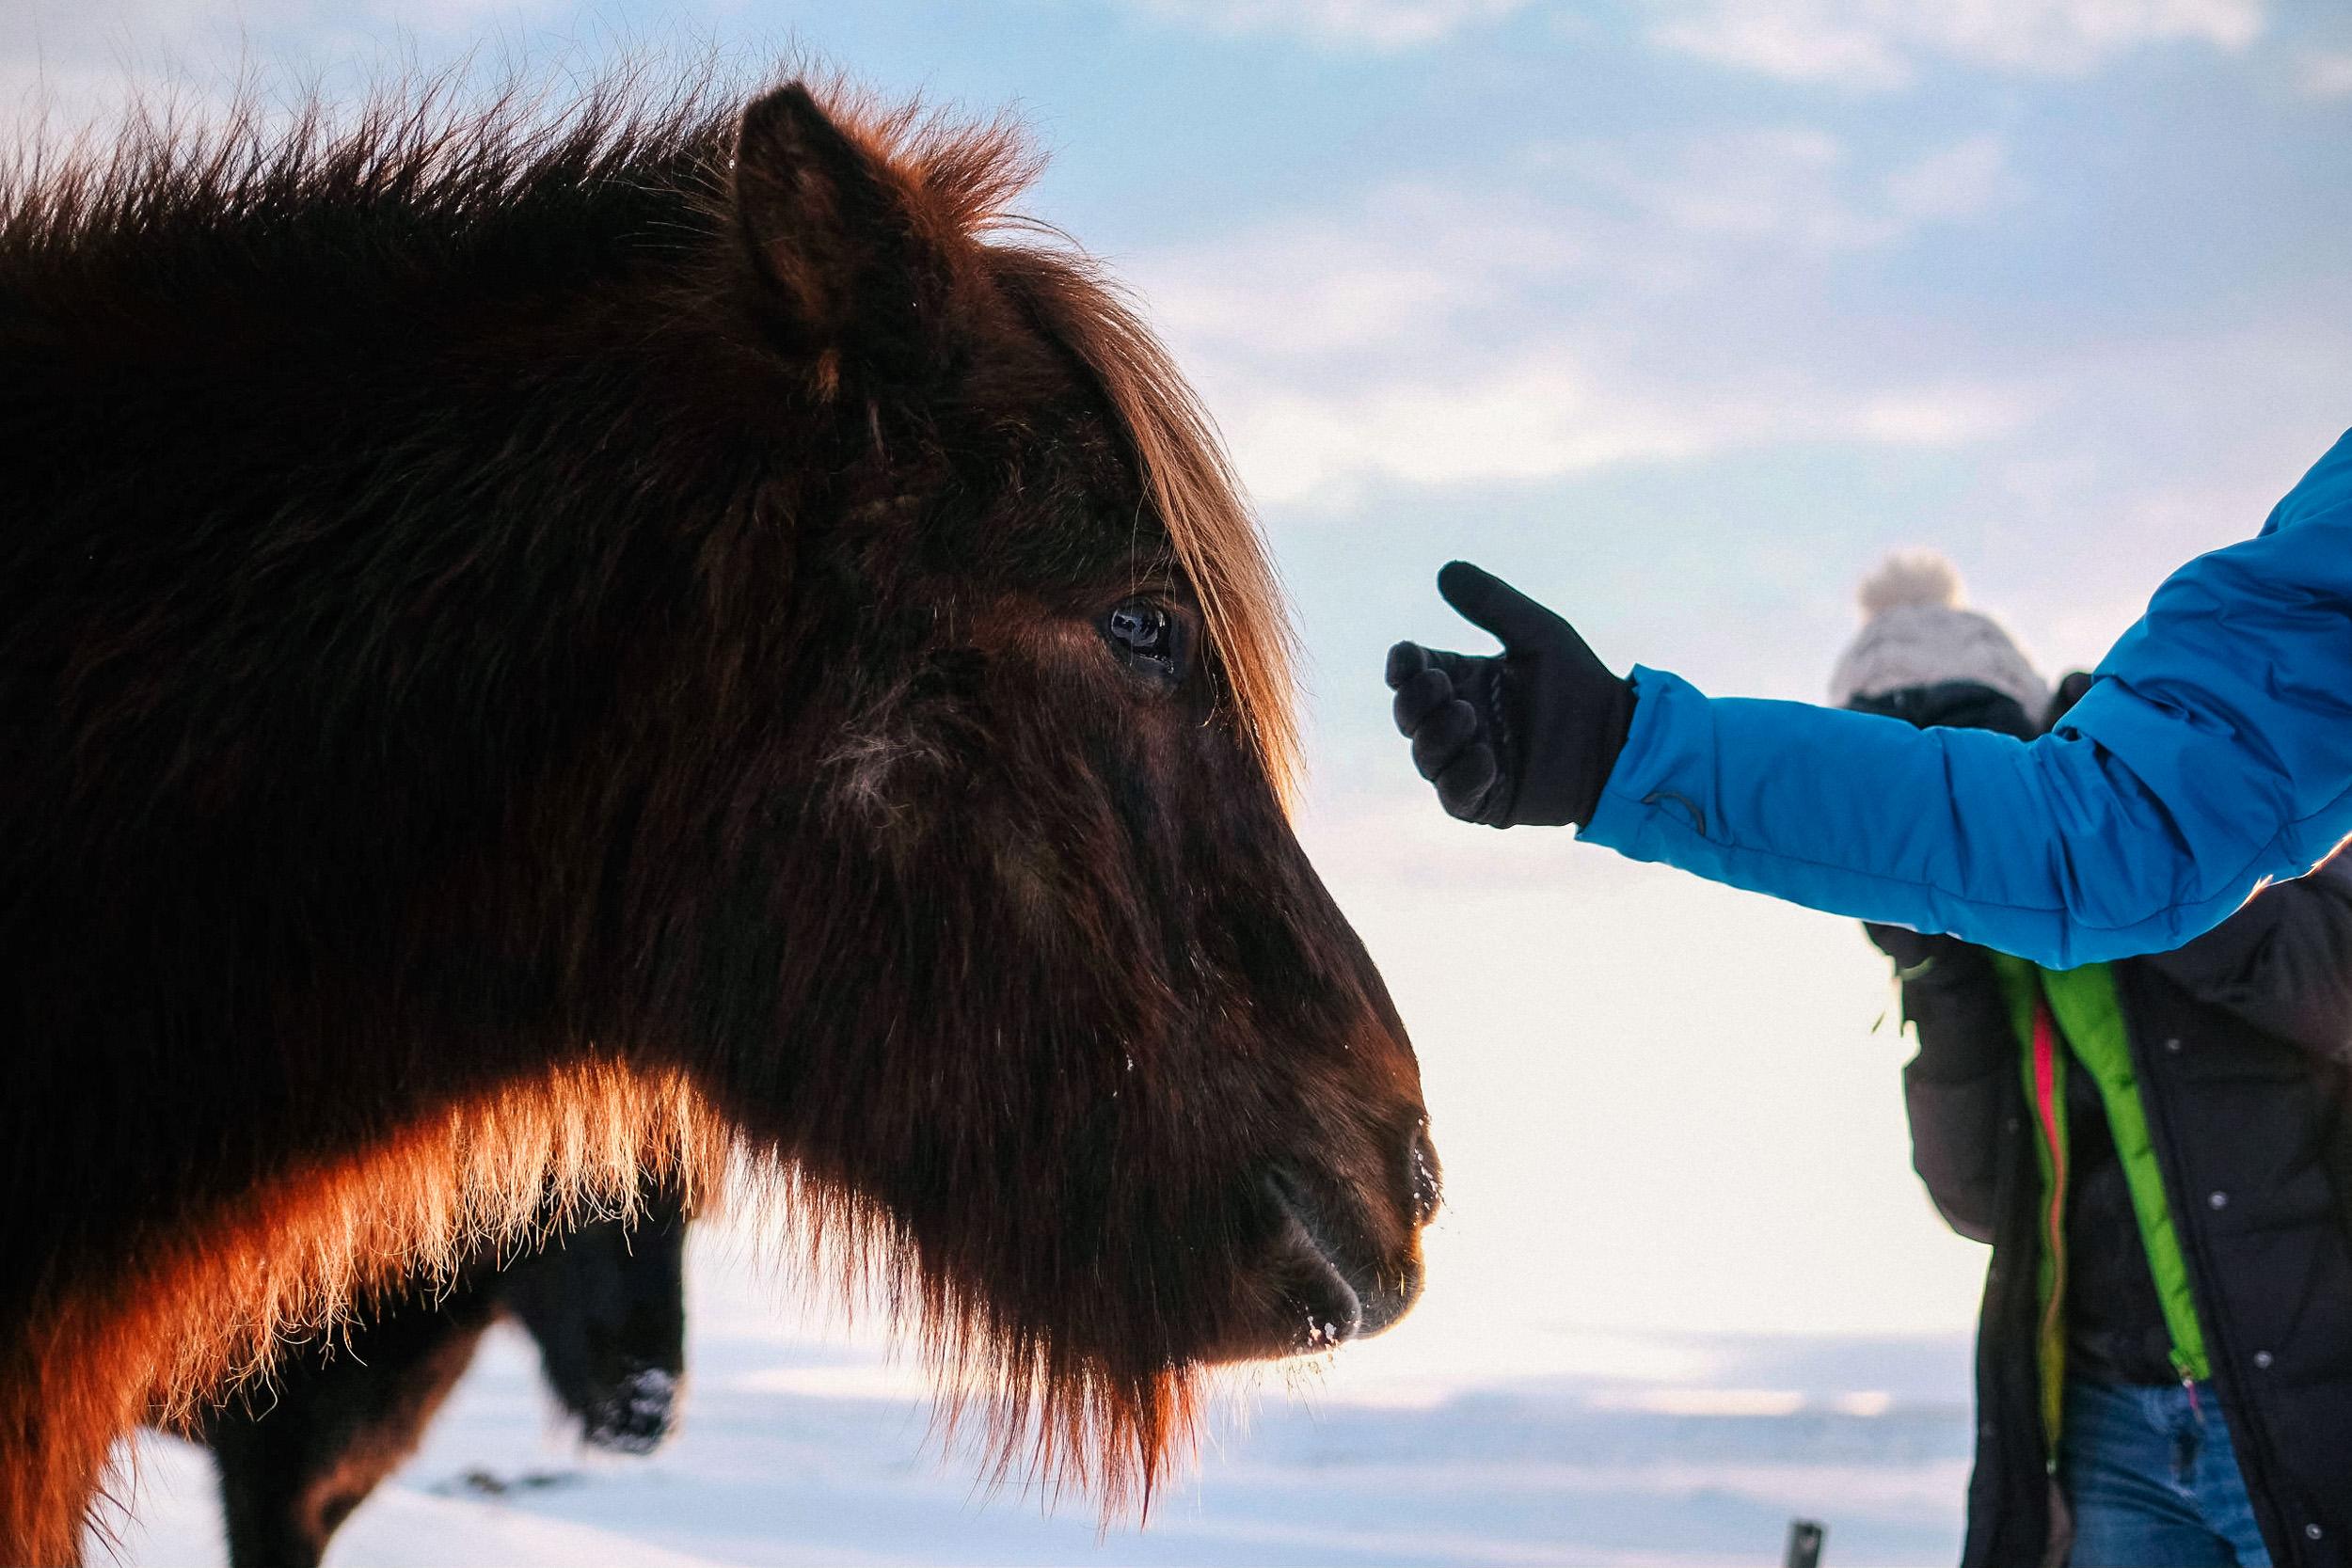 Collective_Wander_Iceland_Photographers_Trip_036.jpg